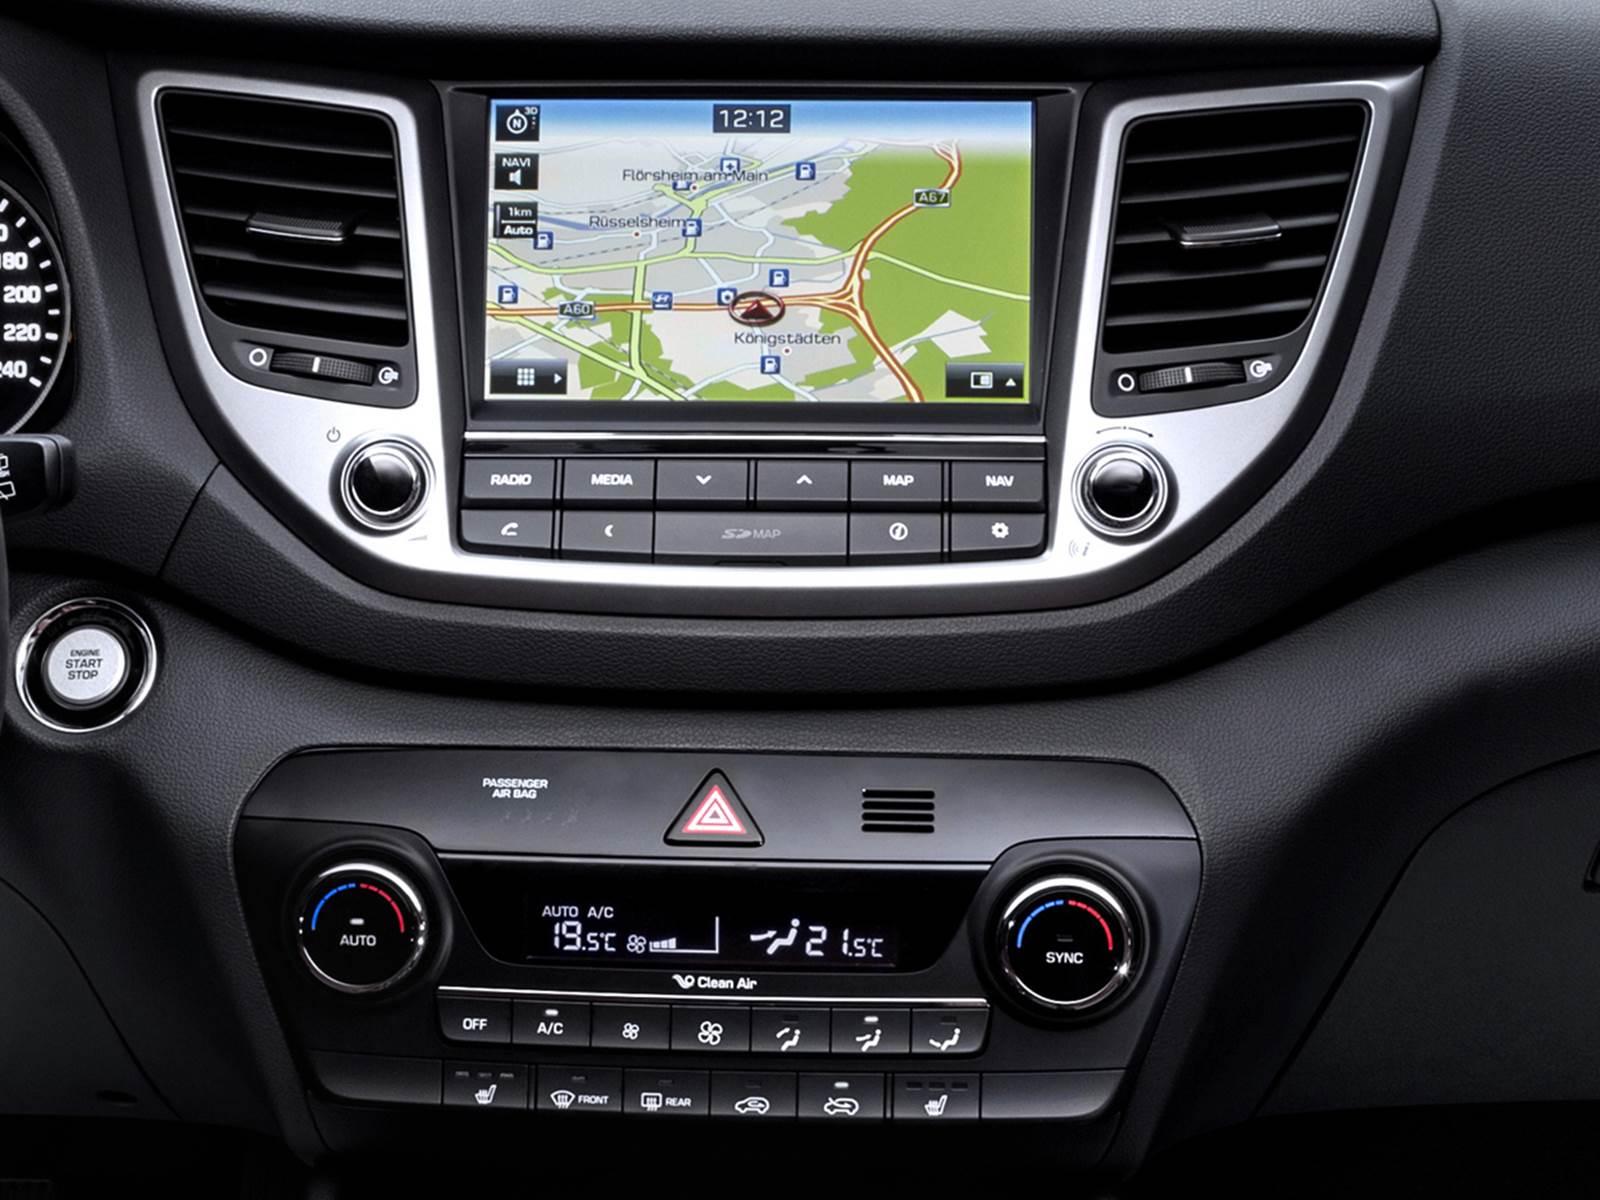 Novo Hyundai Tucson 2016 - infotainment